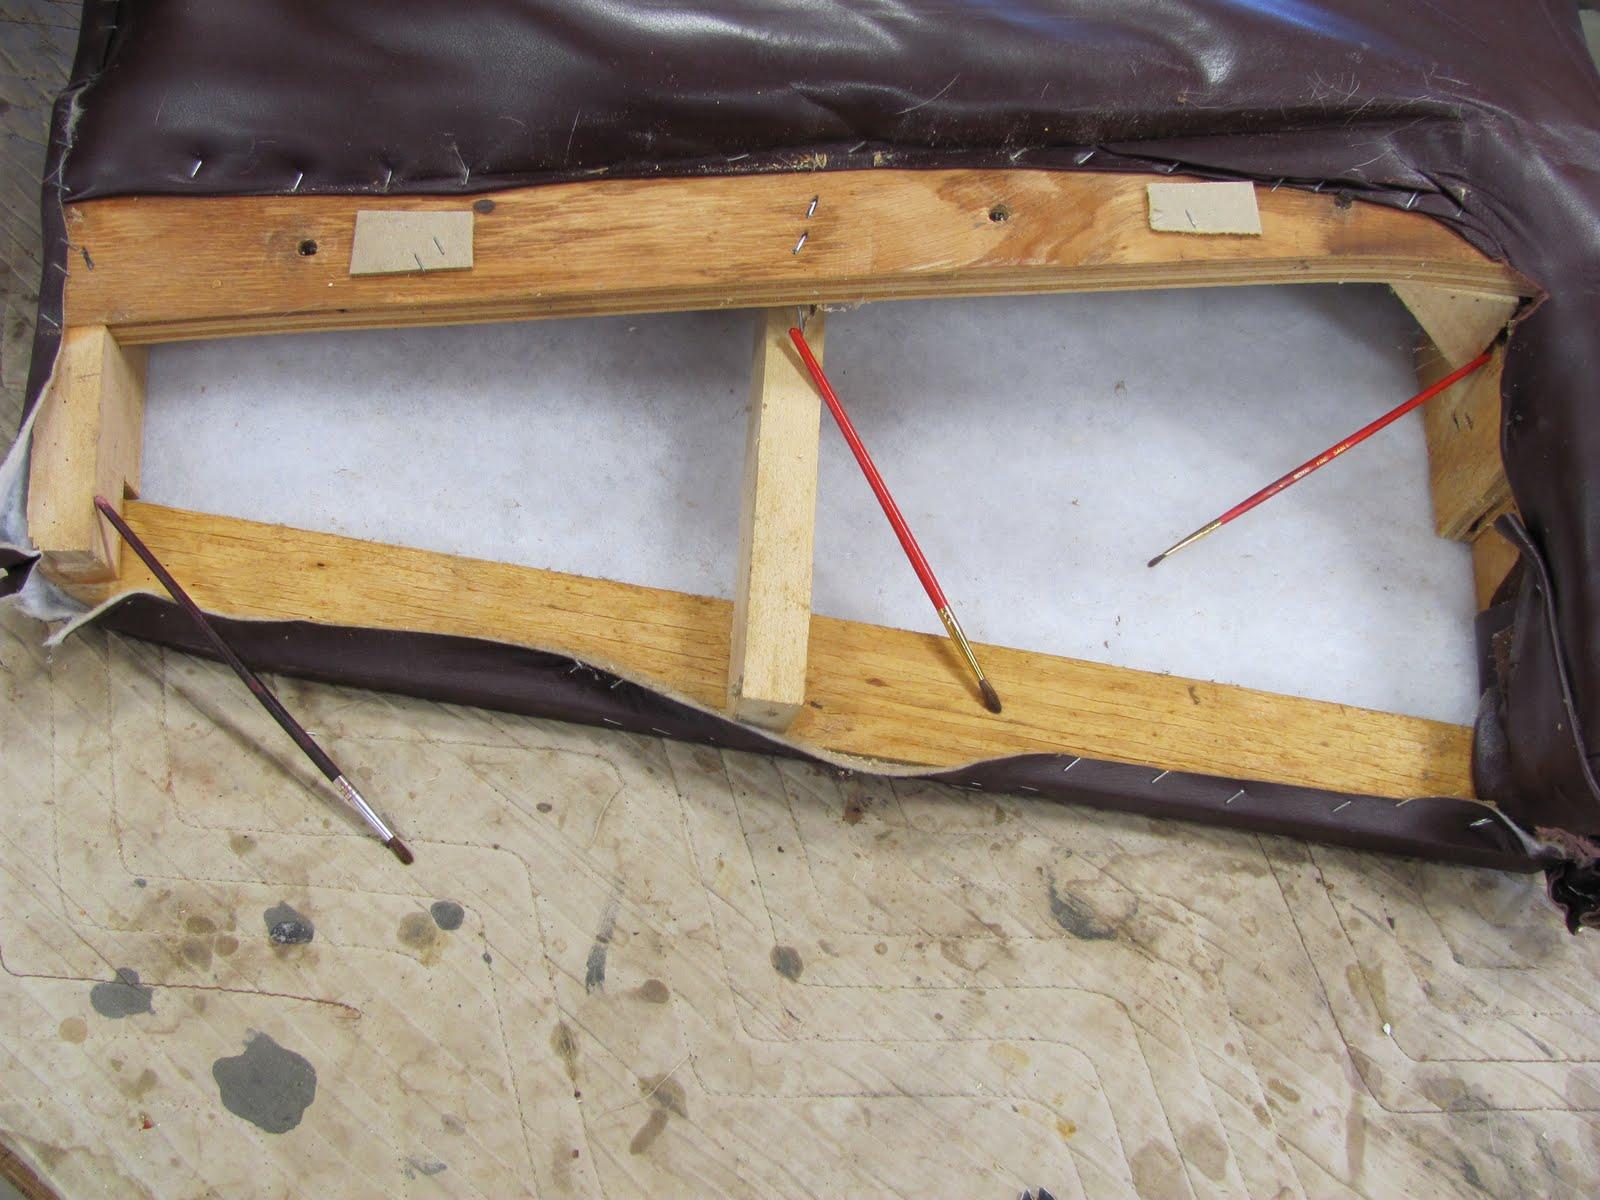 recliner chair handle broken three legged antique thomas nelson furniture restoration arm